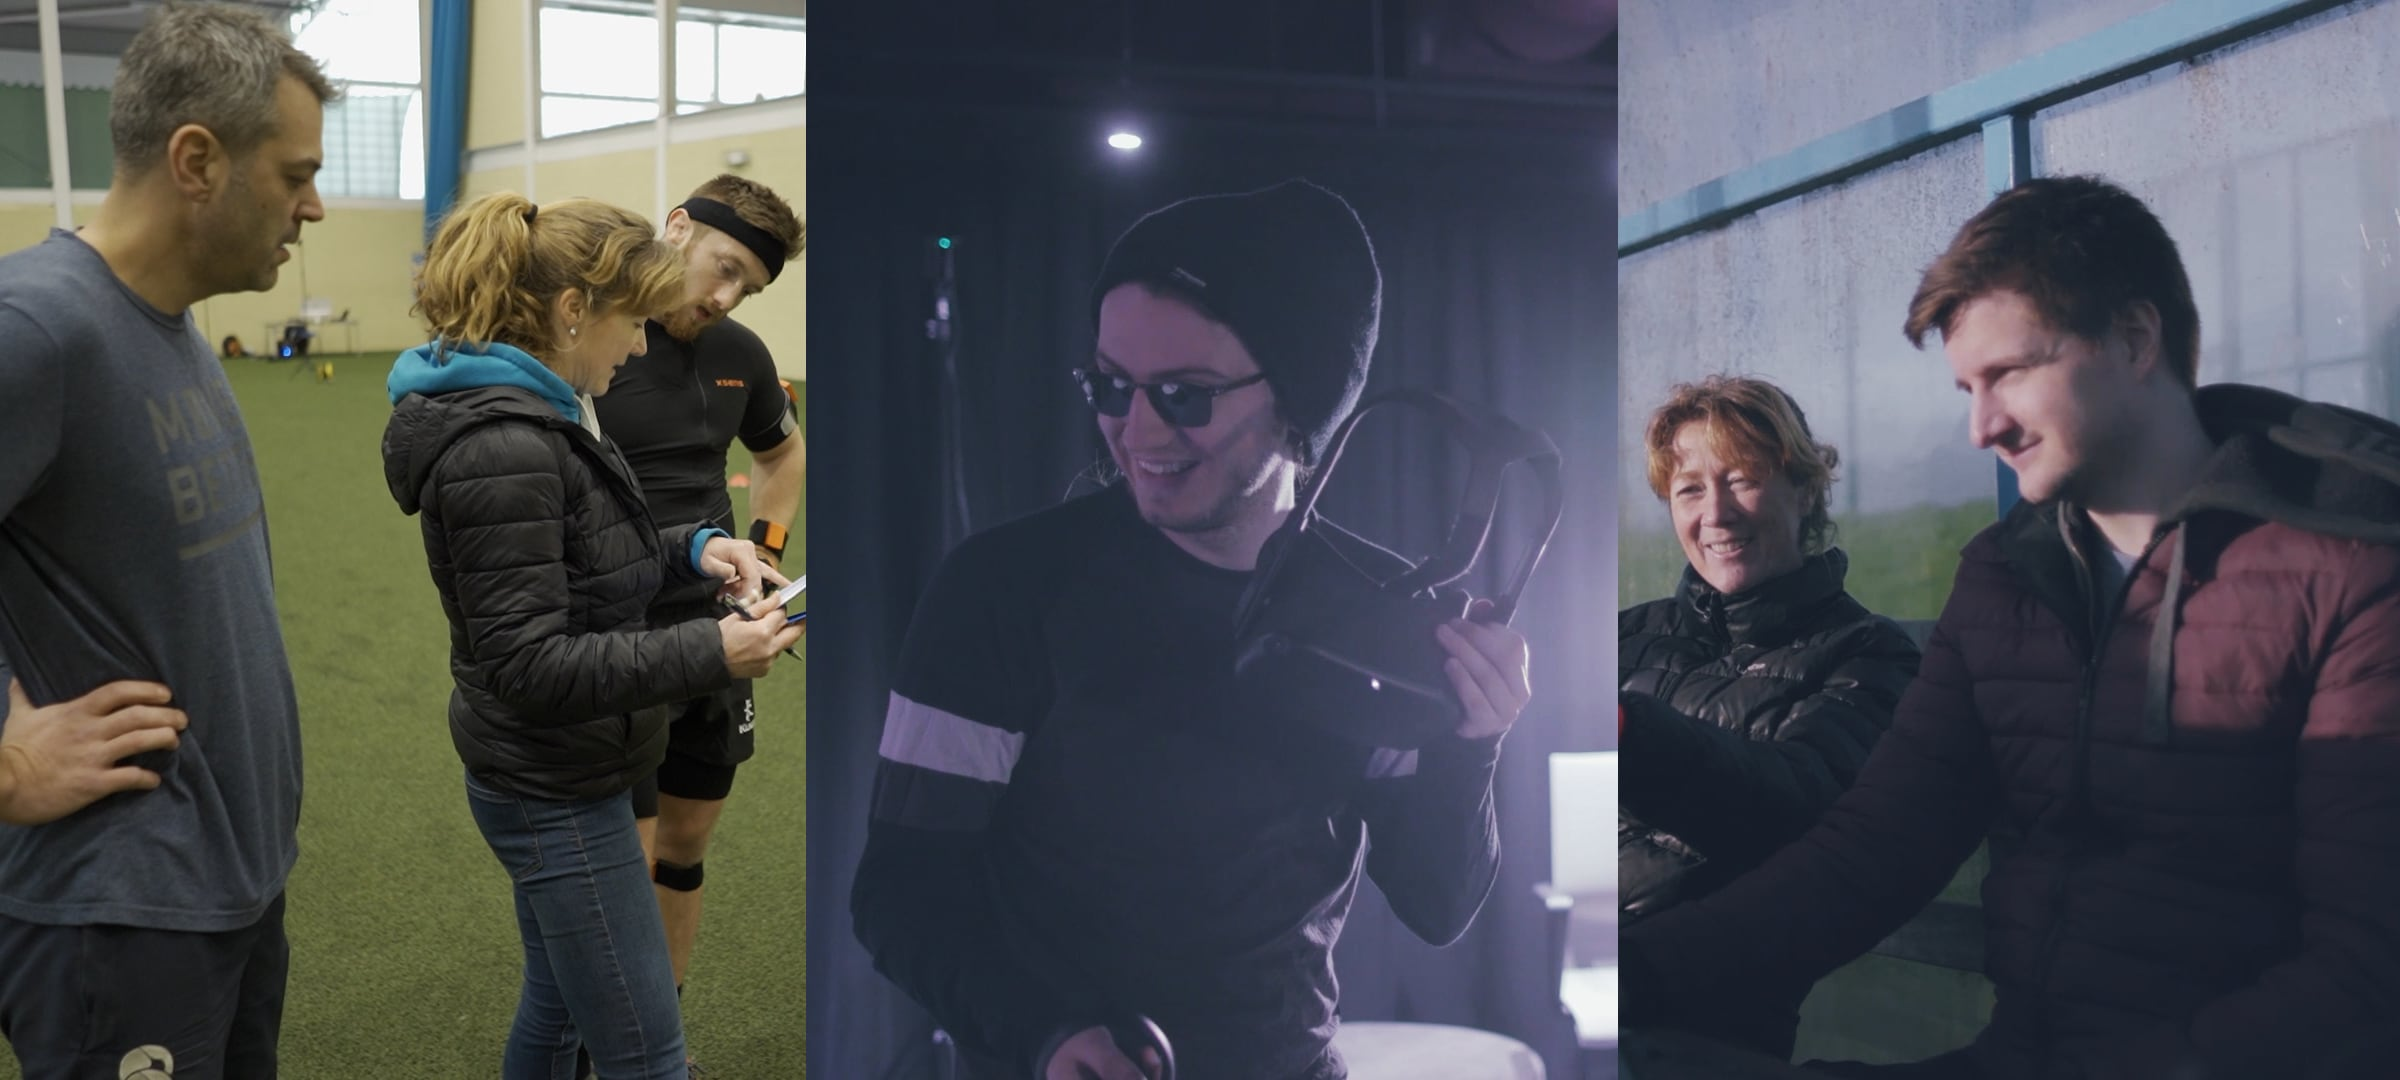 INCISIV team photo in different locations